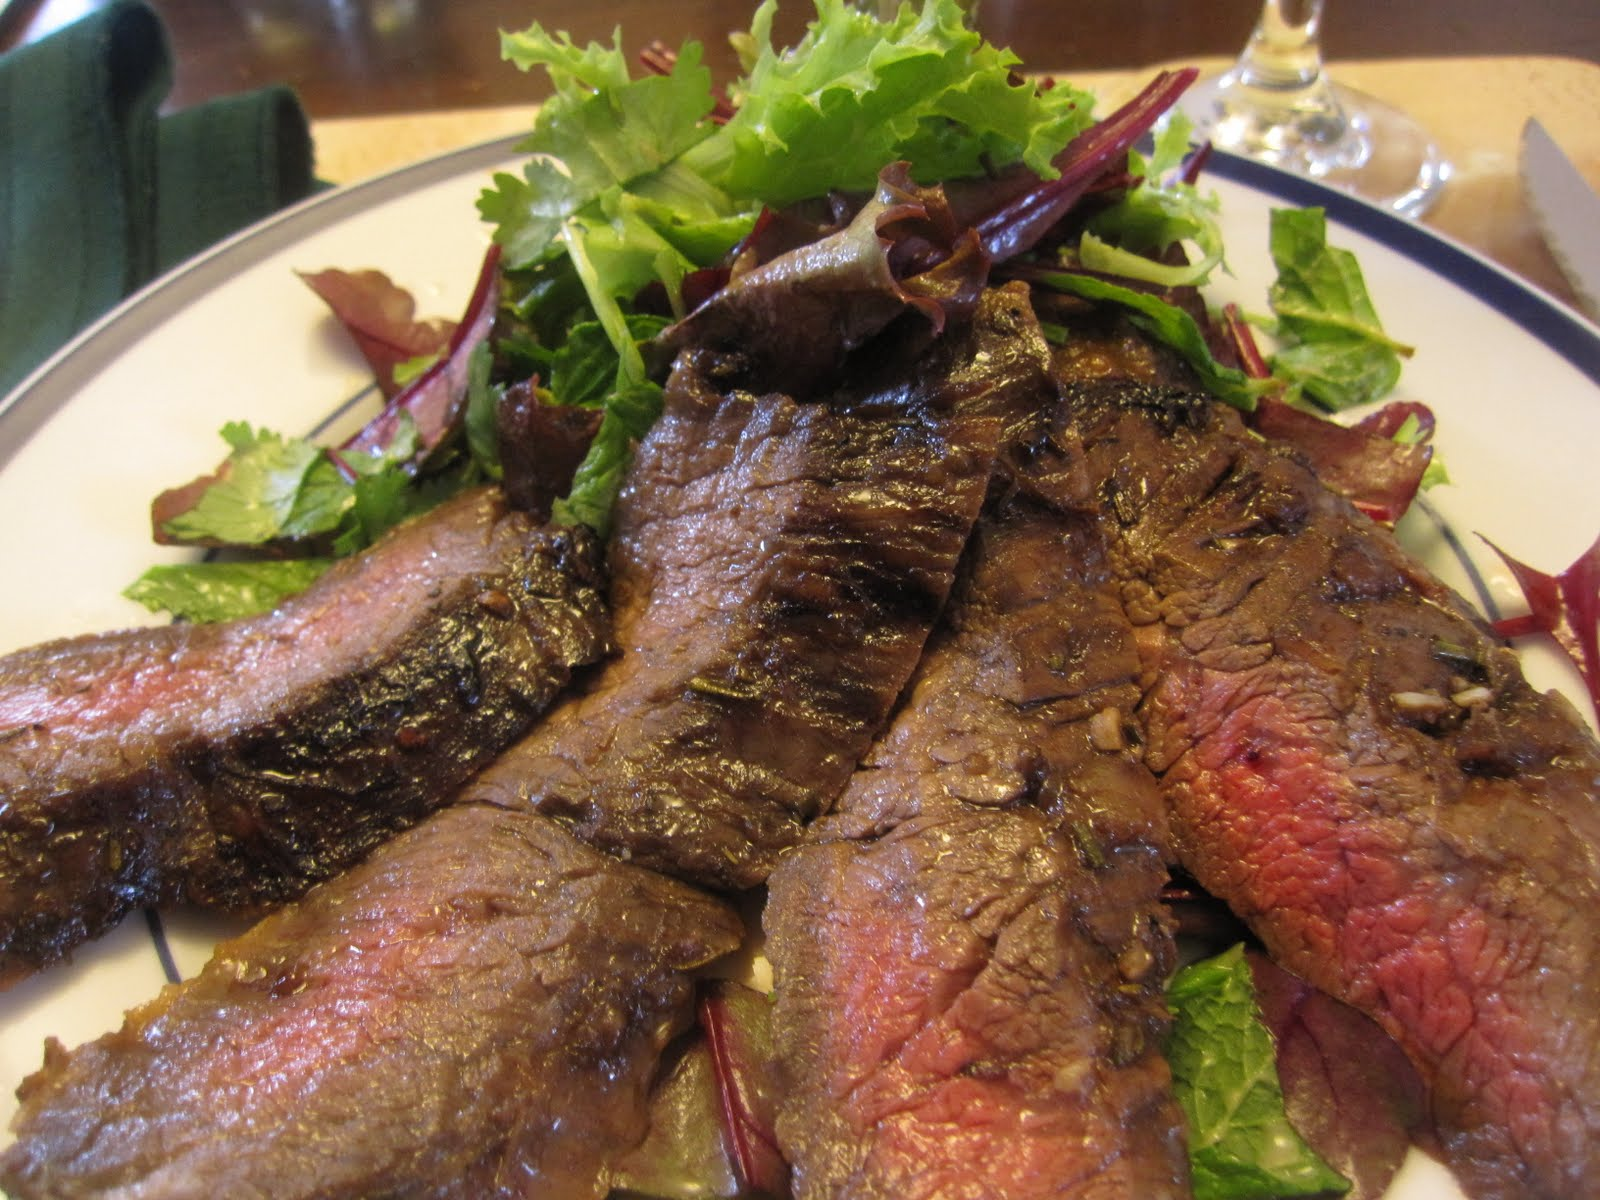 Recipes from 4EveryKitchen: Balsamic Vinegar Marinated Skirt Steak